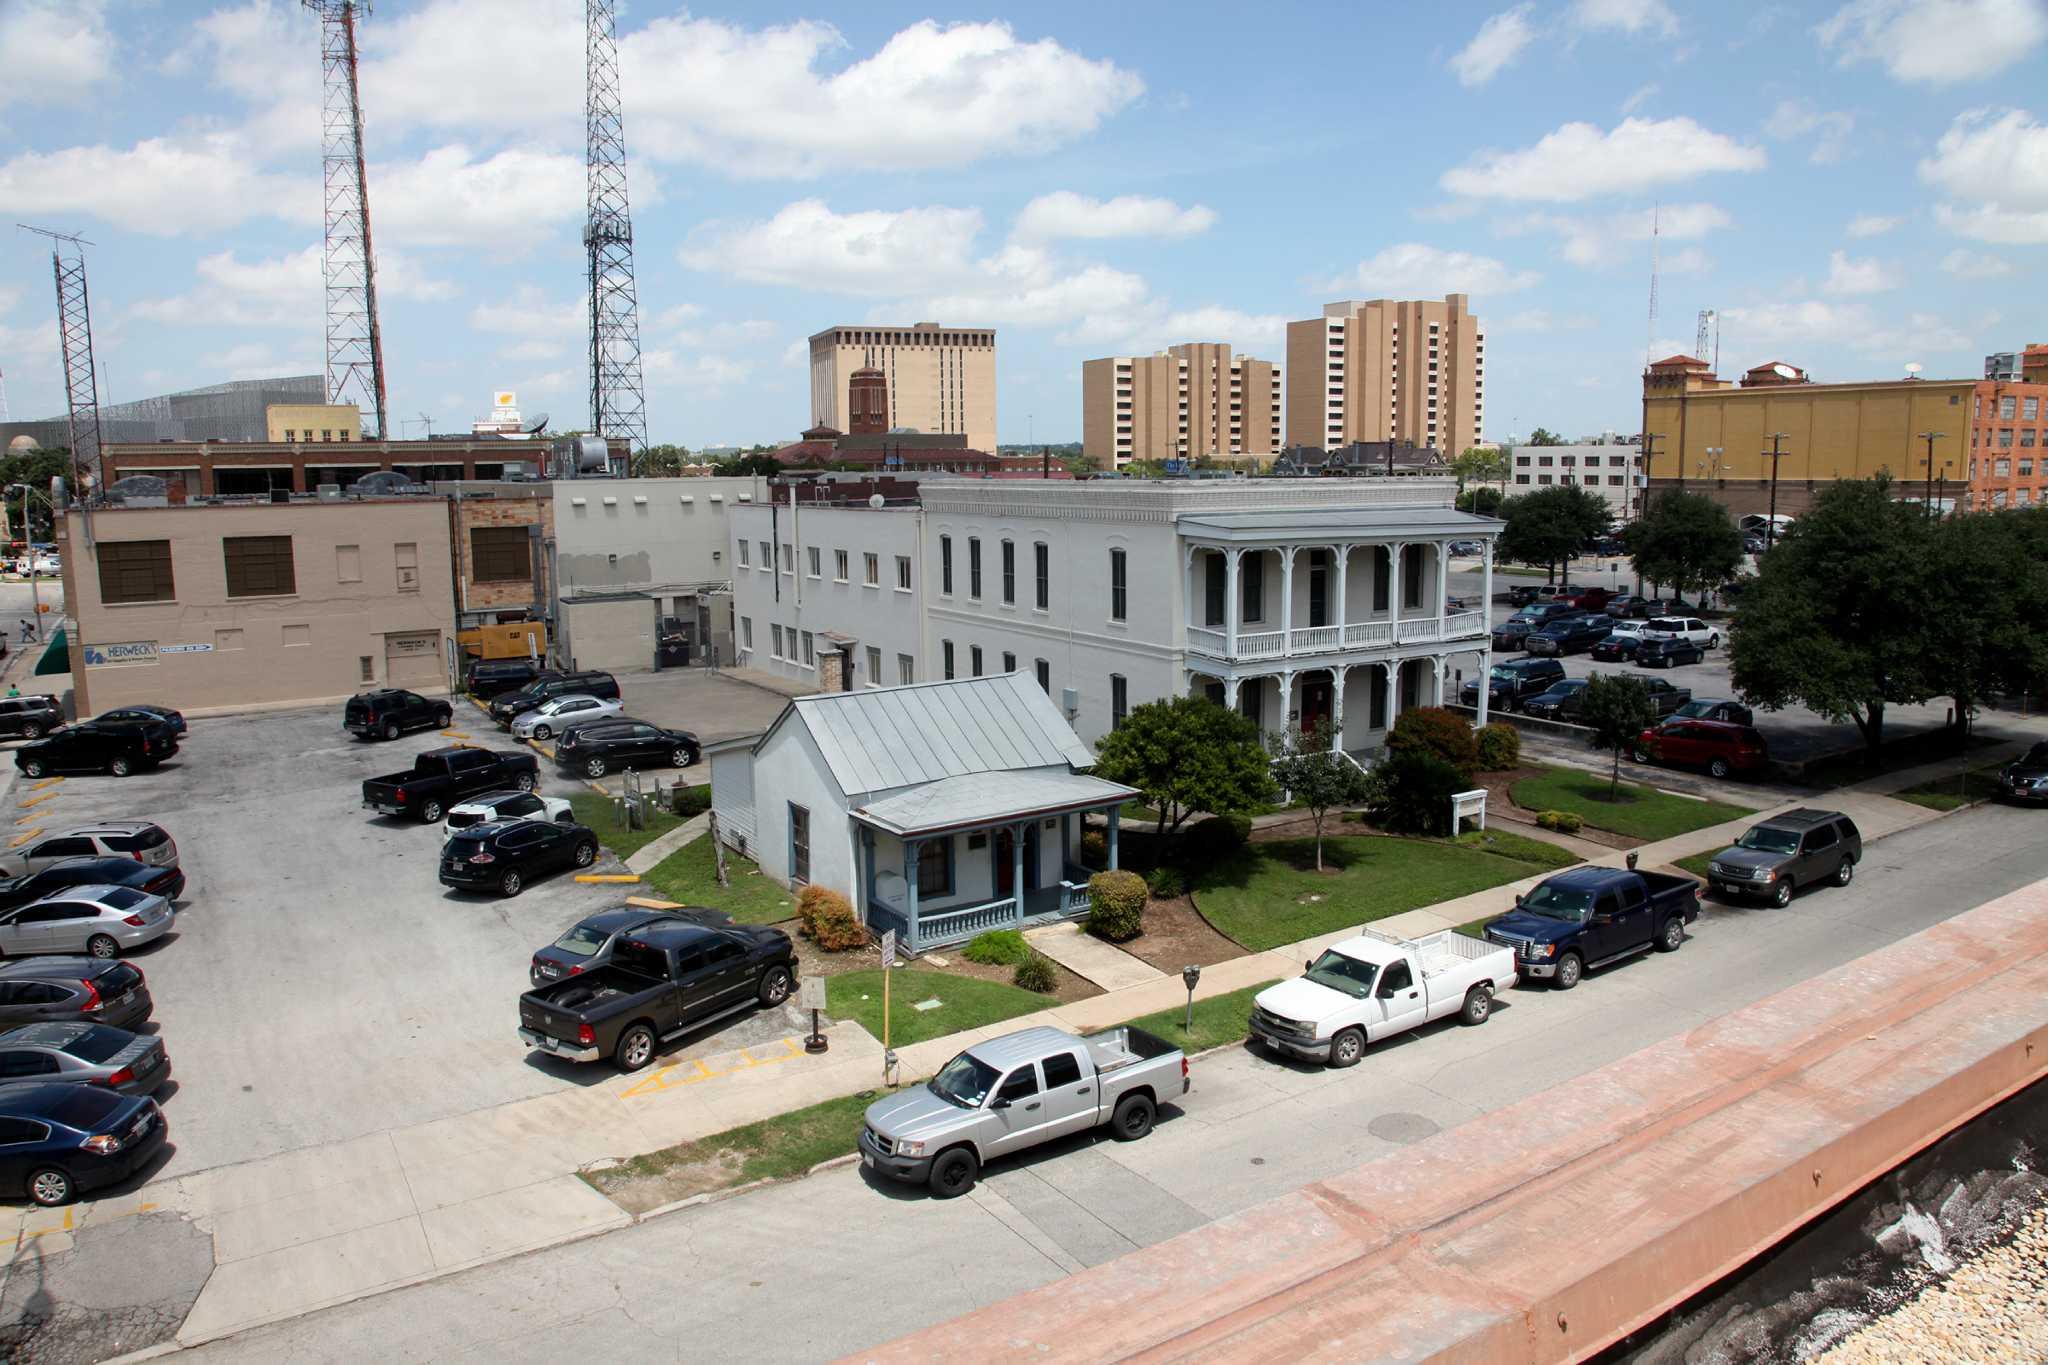 Graystreet Buys Property Near Light Building Downtown